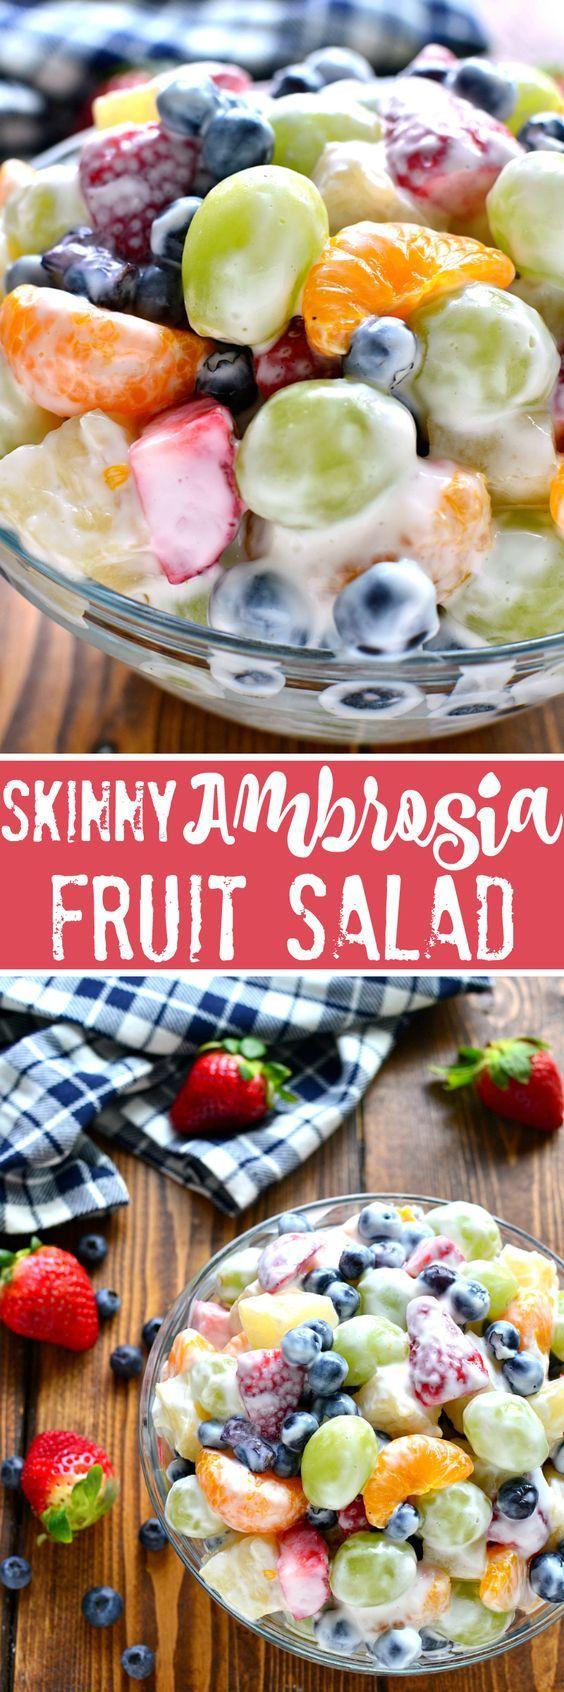 paopu fruit healthy ambrosia fruit salad